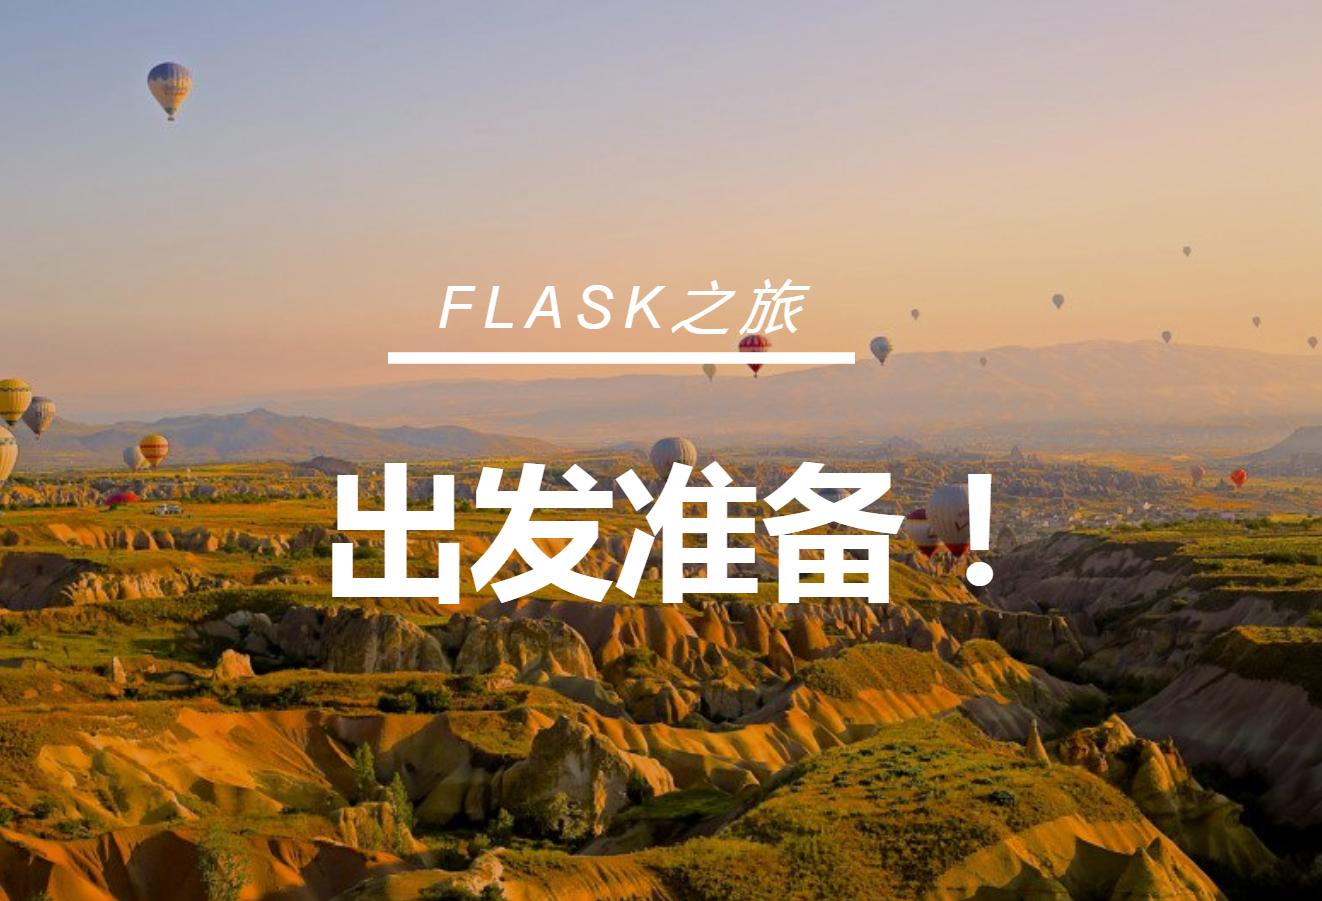 Flask之旅出发准备